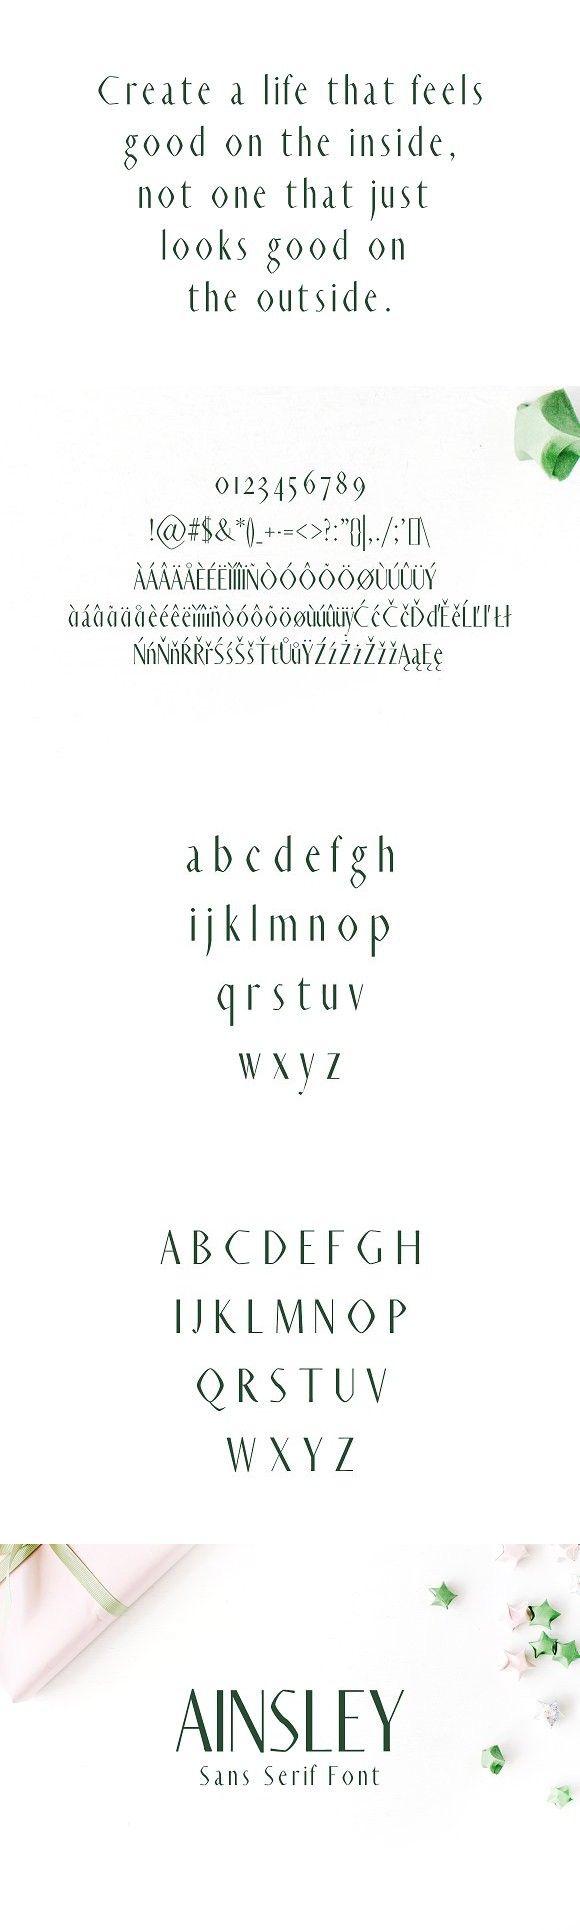 Ainsley Sans Serif Font. Professional Fonts